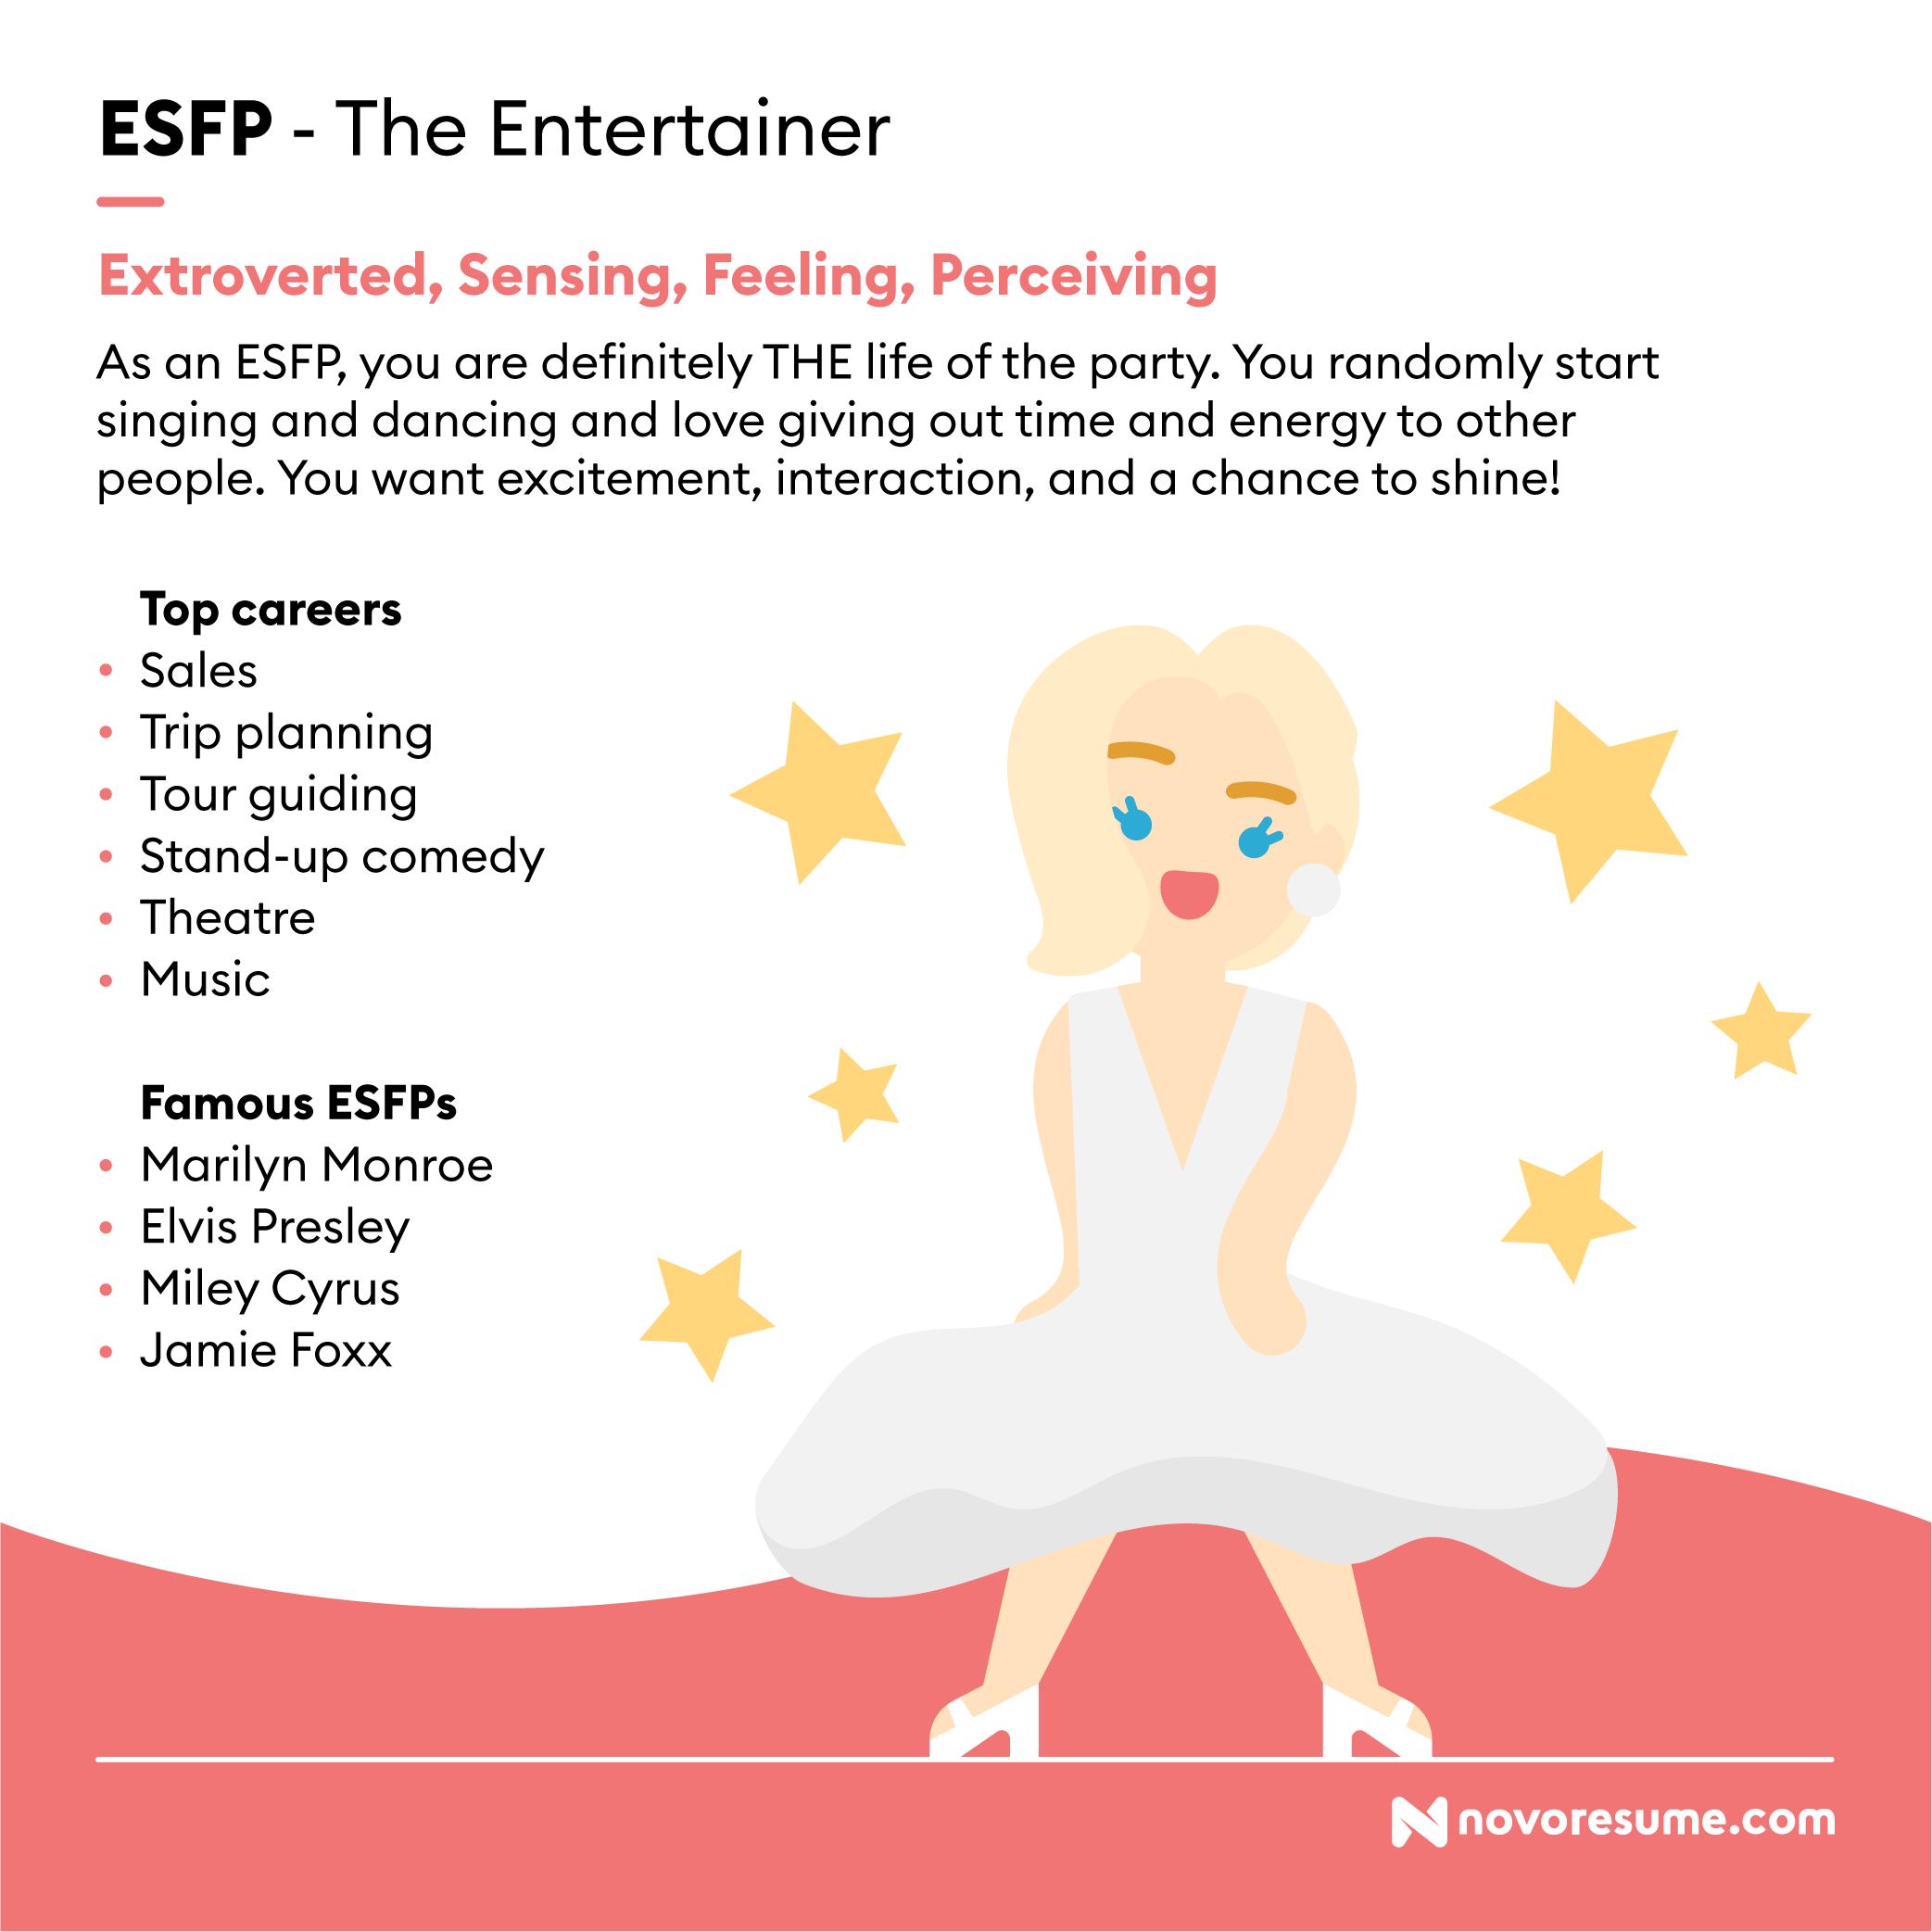 ESFP The Entertainer